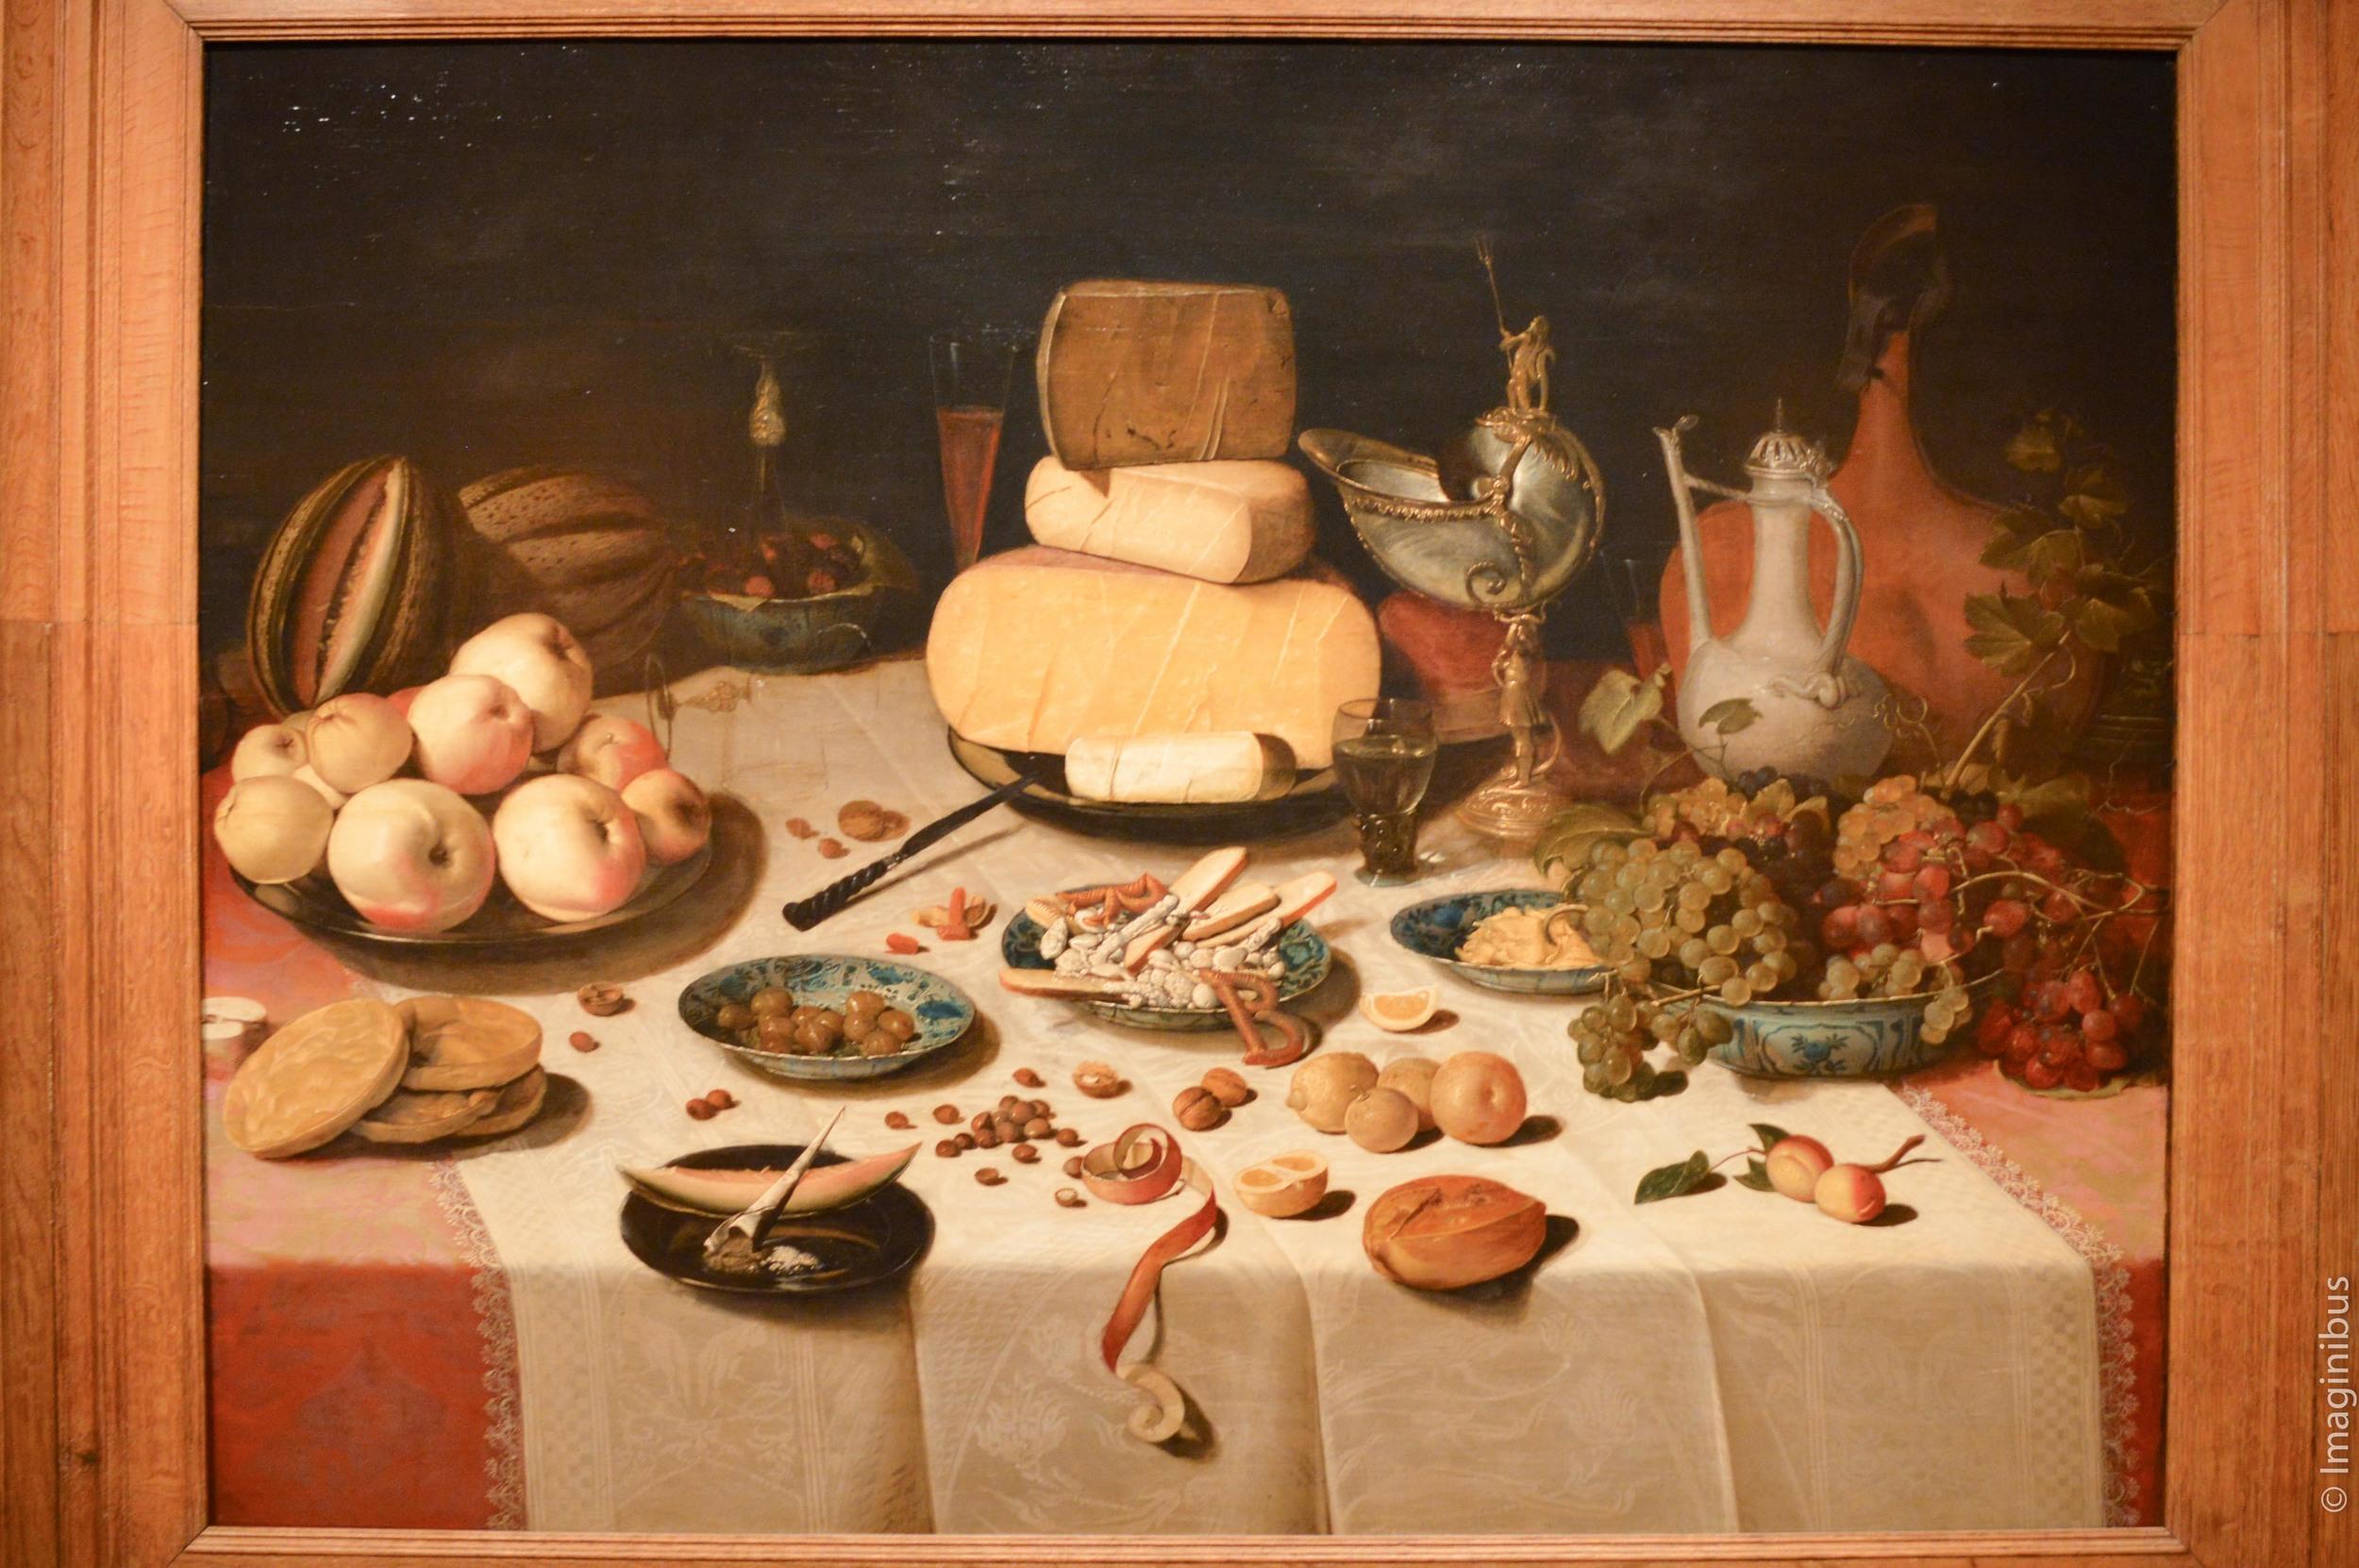 Banquet Piece, Montreal Museum of Fine Arts